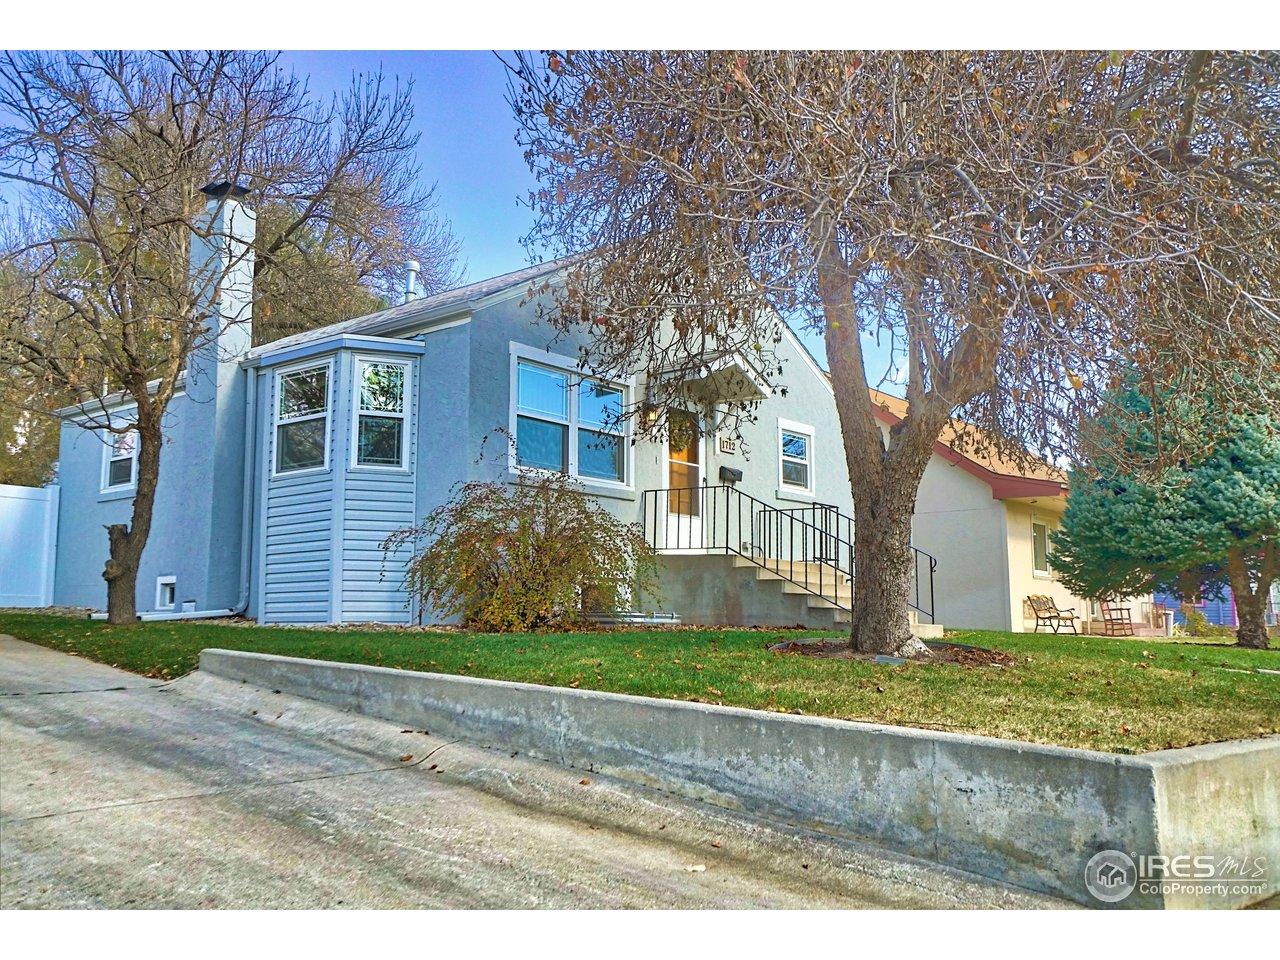 1712 Spruce Ave, Longmont CO 80501